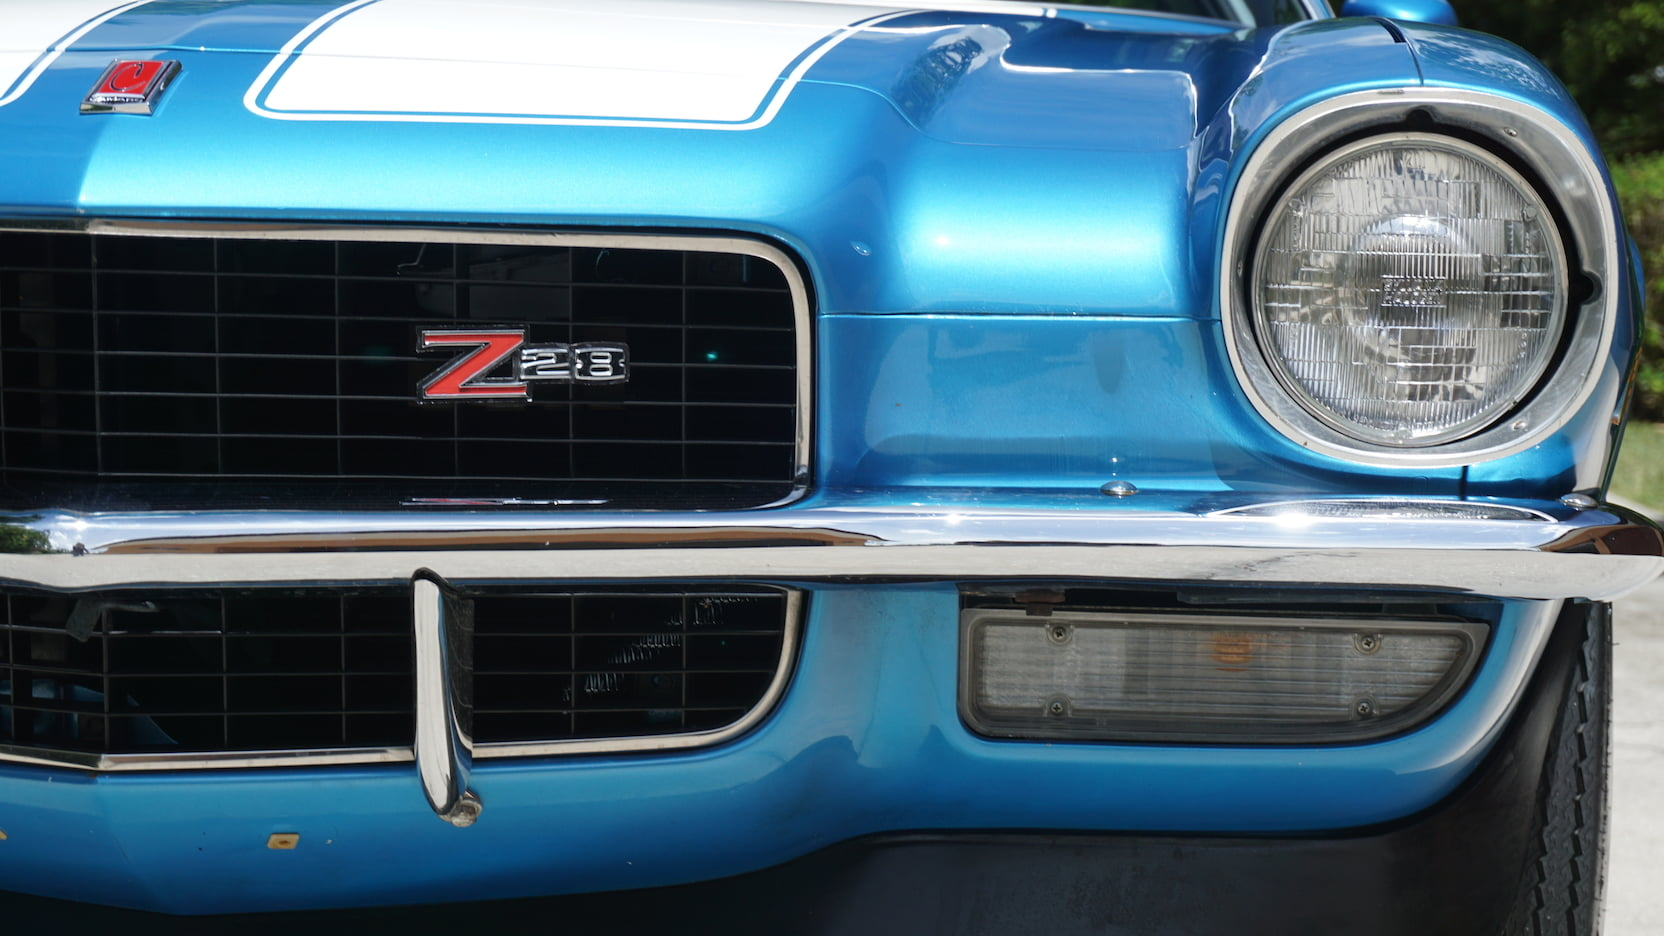 1971 Chevrolet Camaro Z28 nose